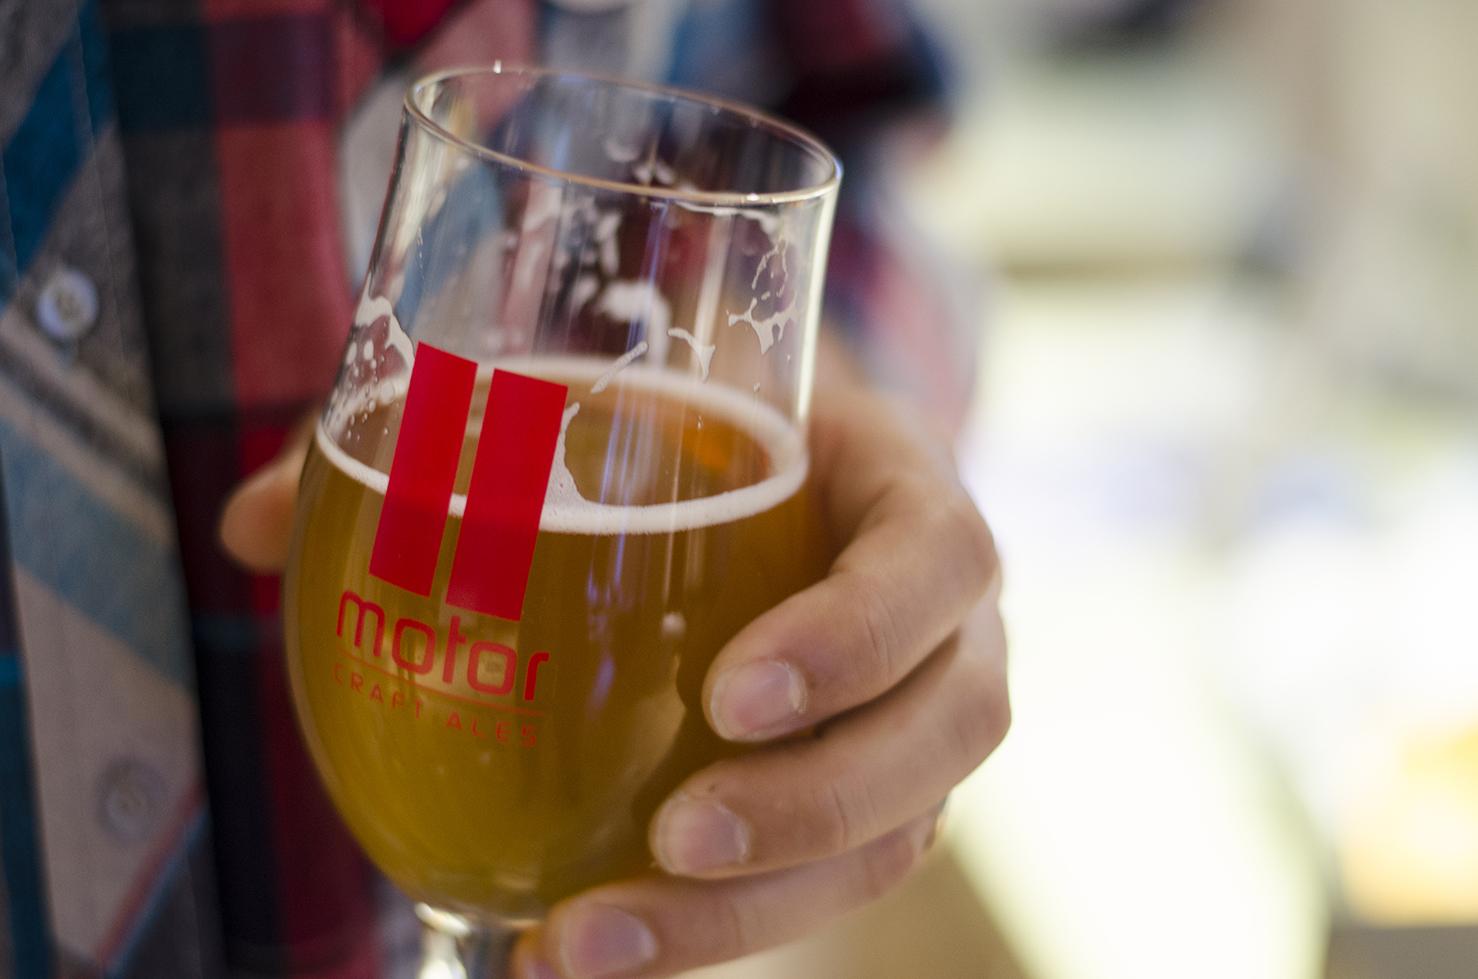 Cheers to good craft beers!